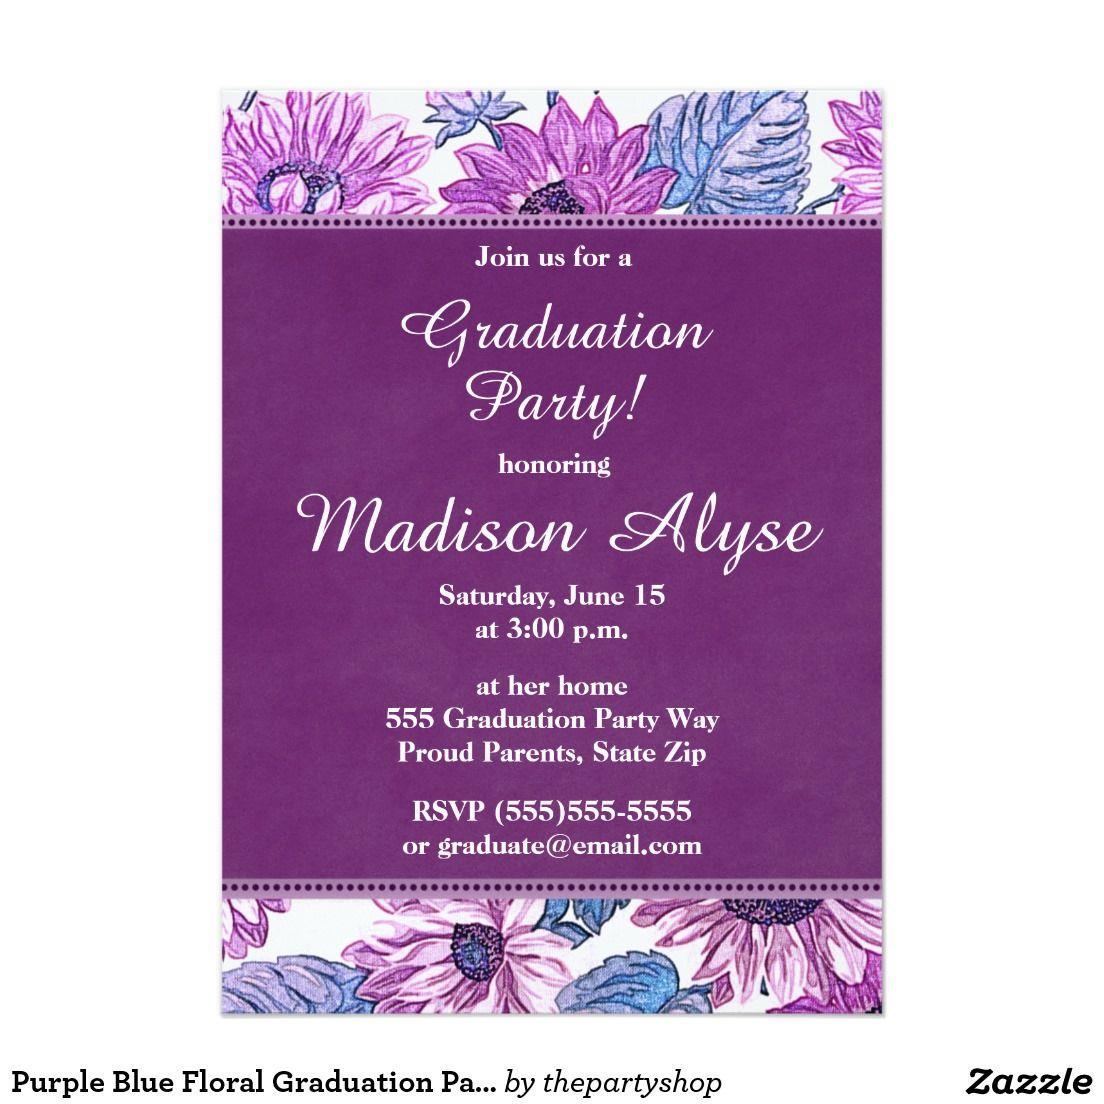 Purple blue floral graduation party invitation pinterest party purple blue floral graduation party invitation httpzazzle thepartyshoprf238200194340614103 filmwisefo